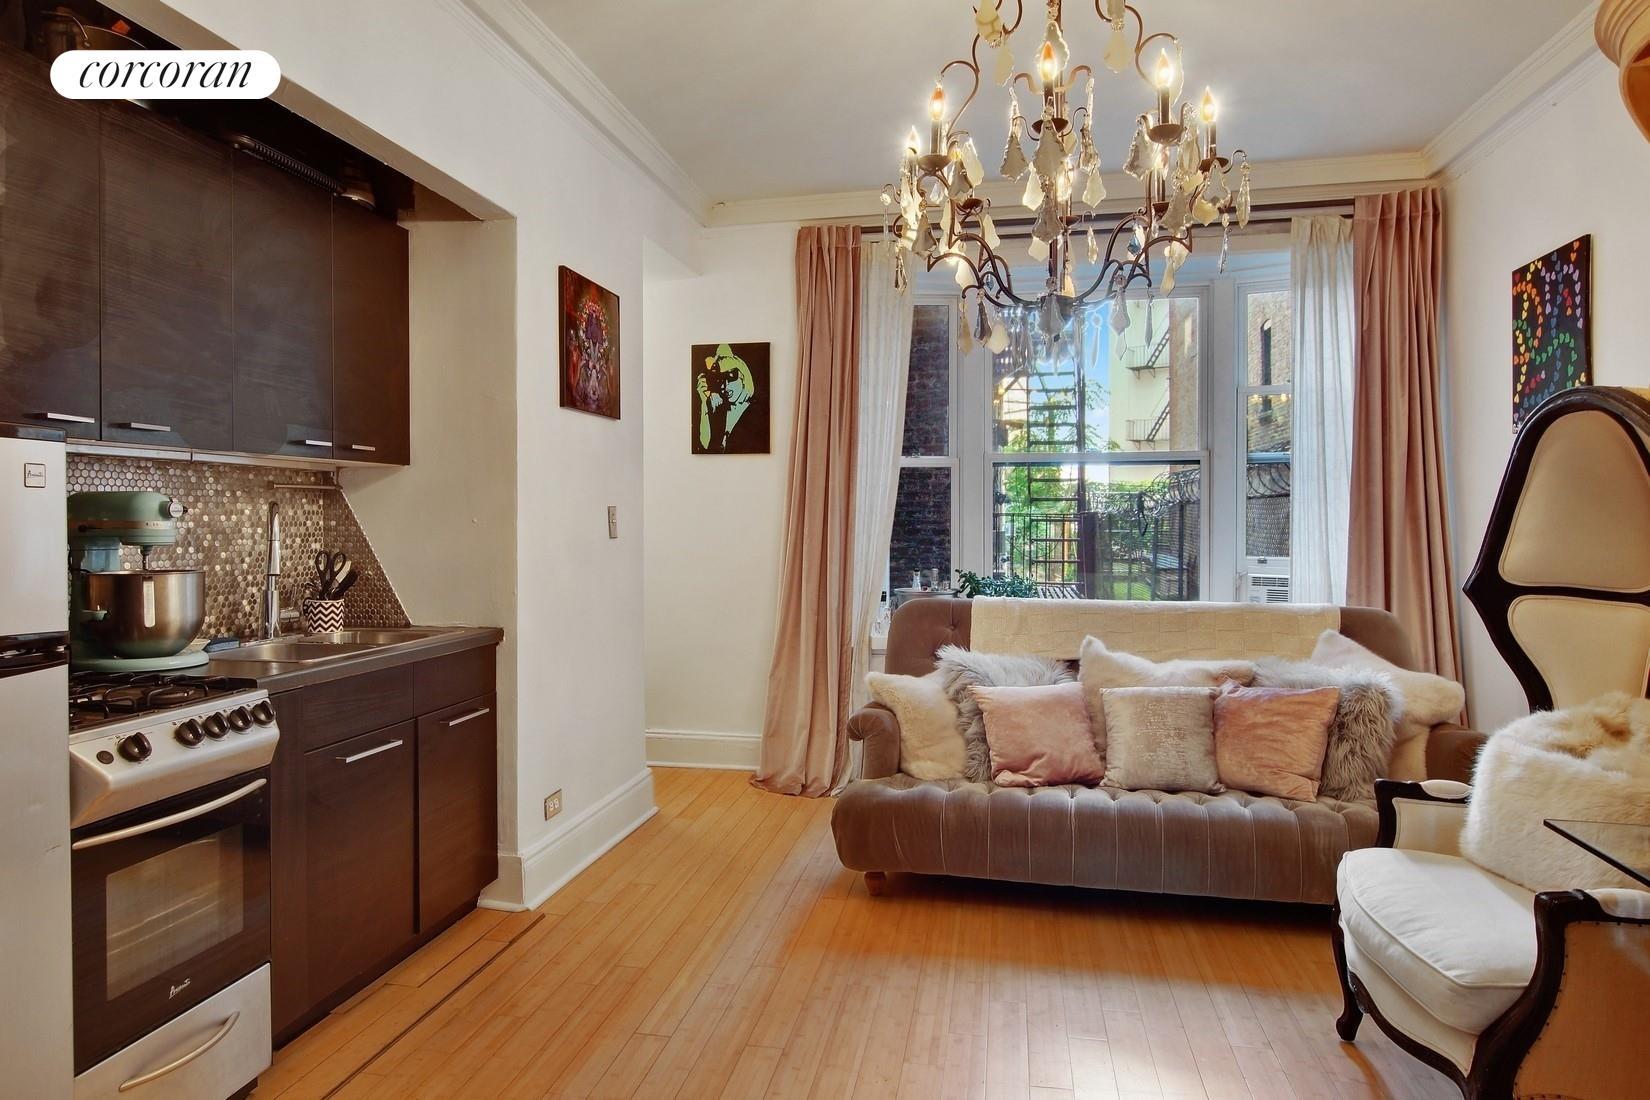 Morningside Heights Real Estate, Morningside Heights Homes for sale ...